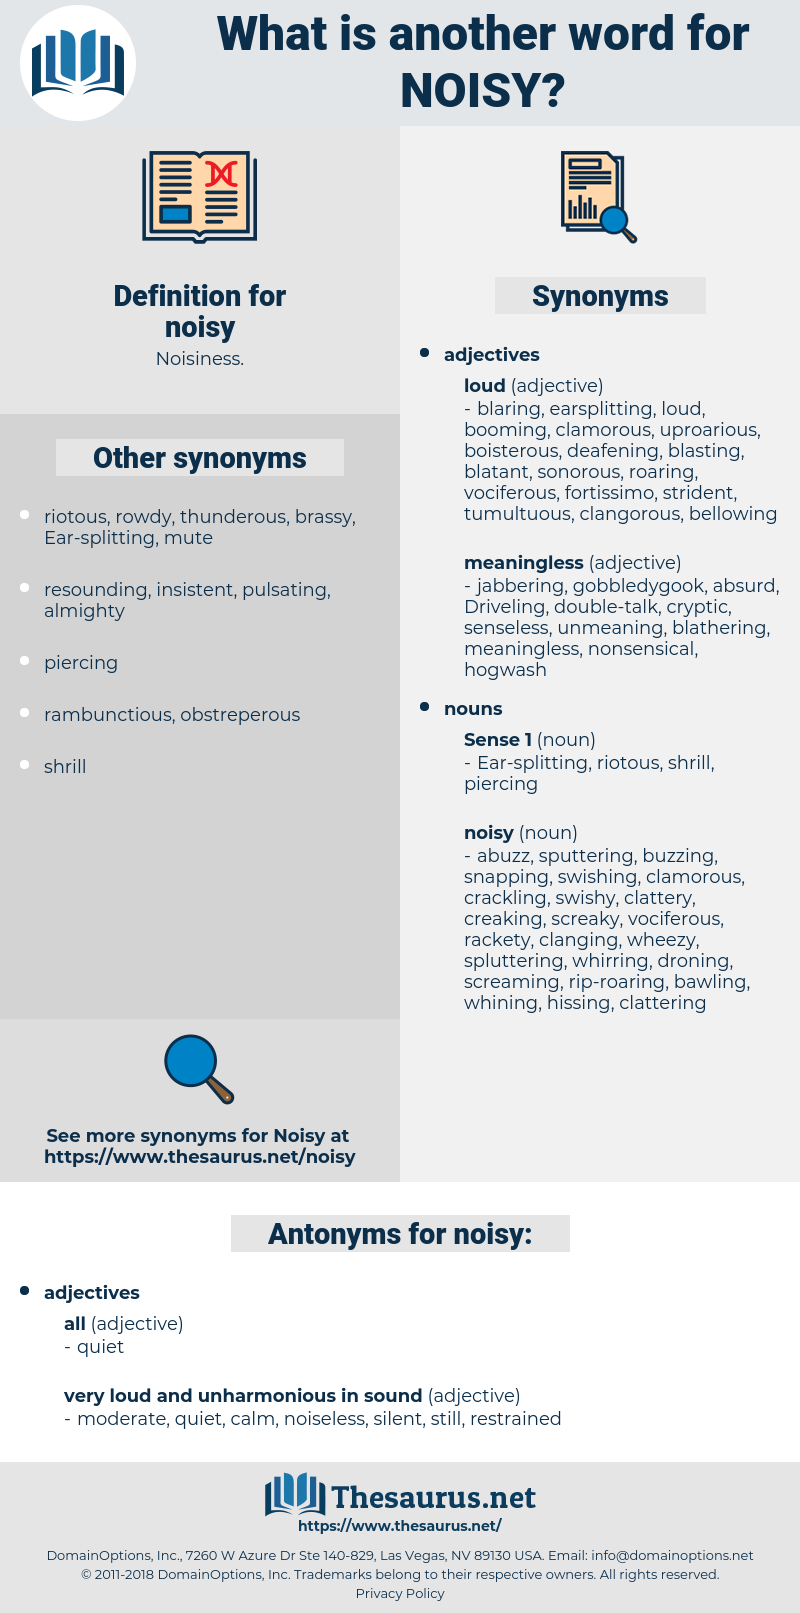 noisy, synonym noisy, another word for noisy, words like noisy, thesaurus noisy